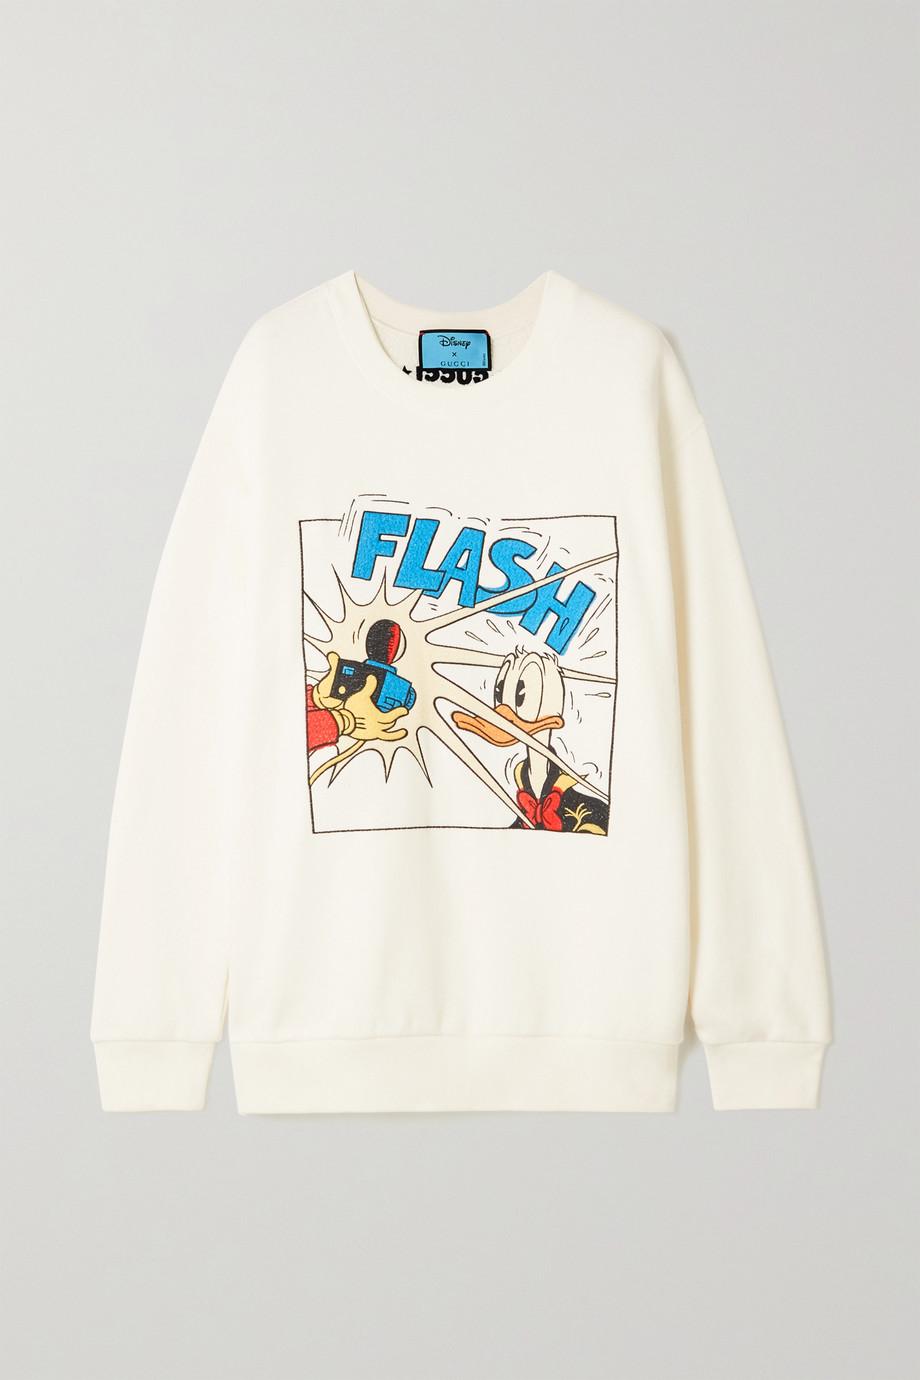 Gucci + NET SUSTAIN + Disney embroidered organic cotton-jersey sweatshirt